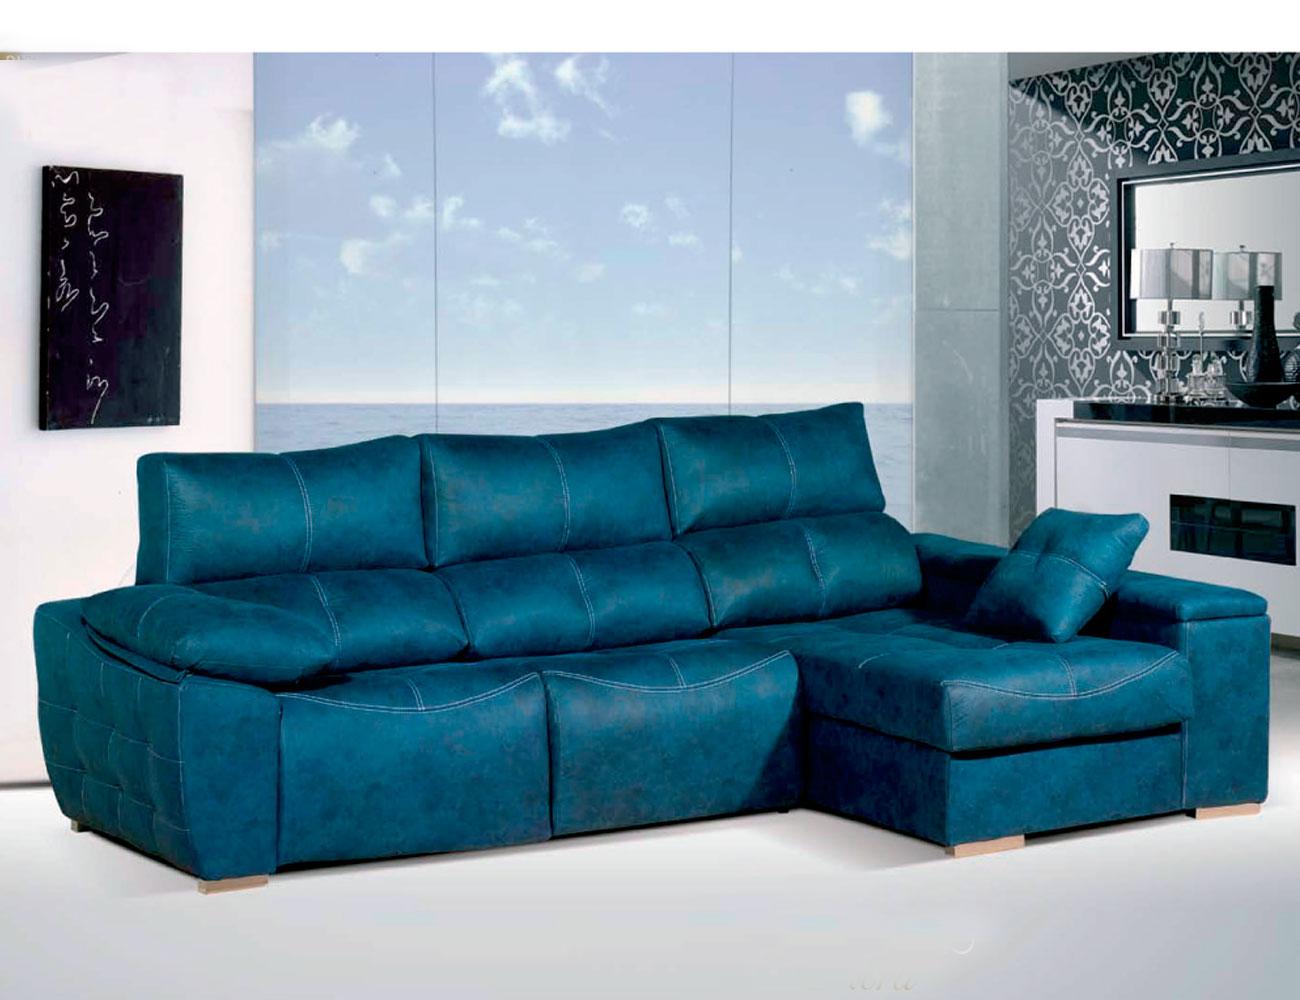 Sofa chaiselongue relax 2 motores anti manchas turquesa39